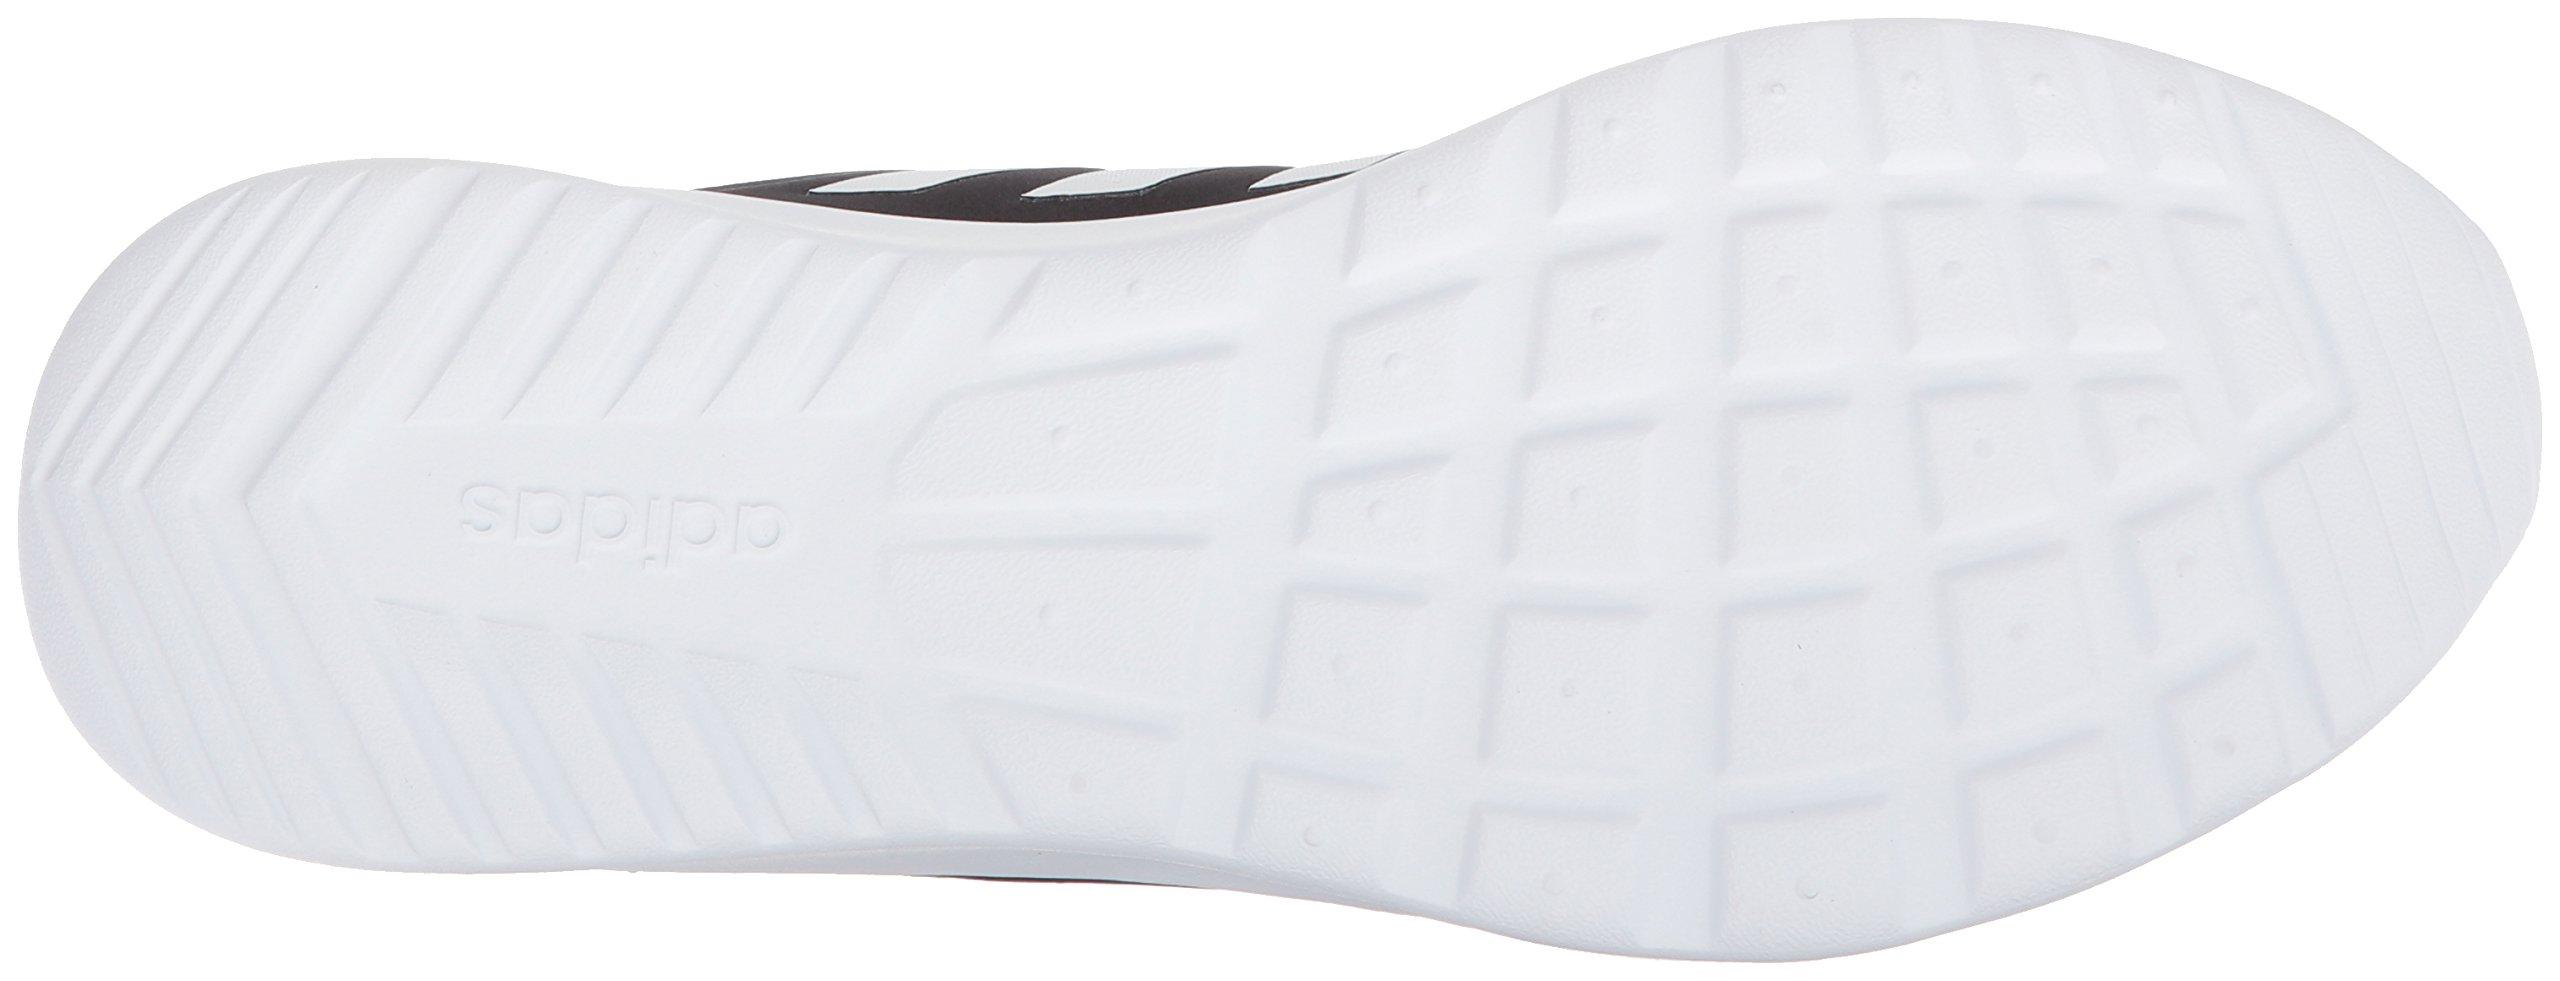 adidas Women's Cloudfoam QT Racer Running Shoe, Black/White/Carbon, 5 M US by adidas (Image #3)